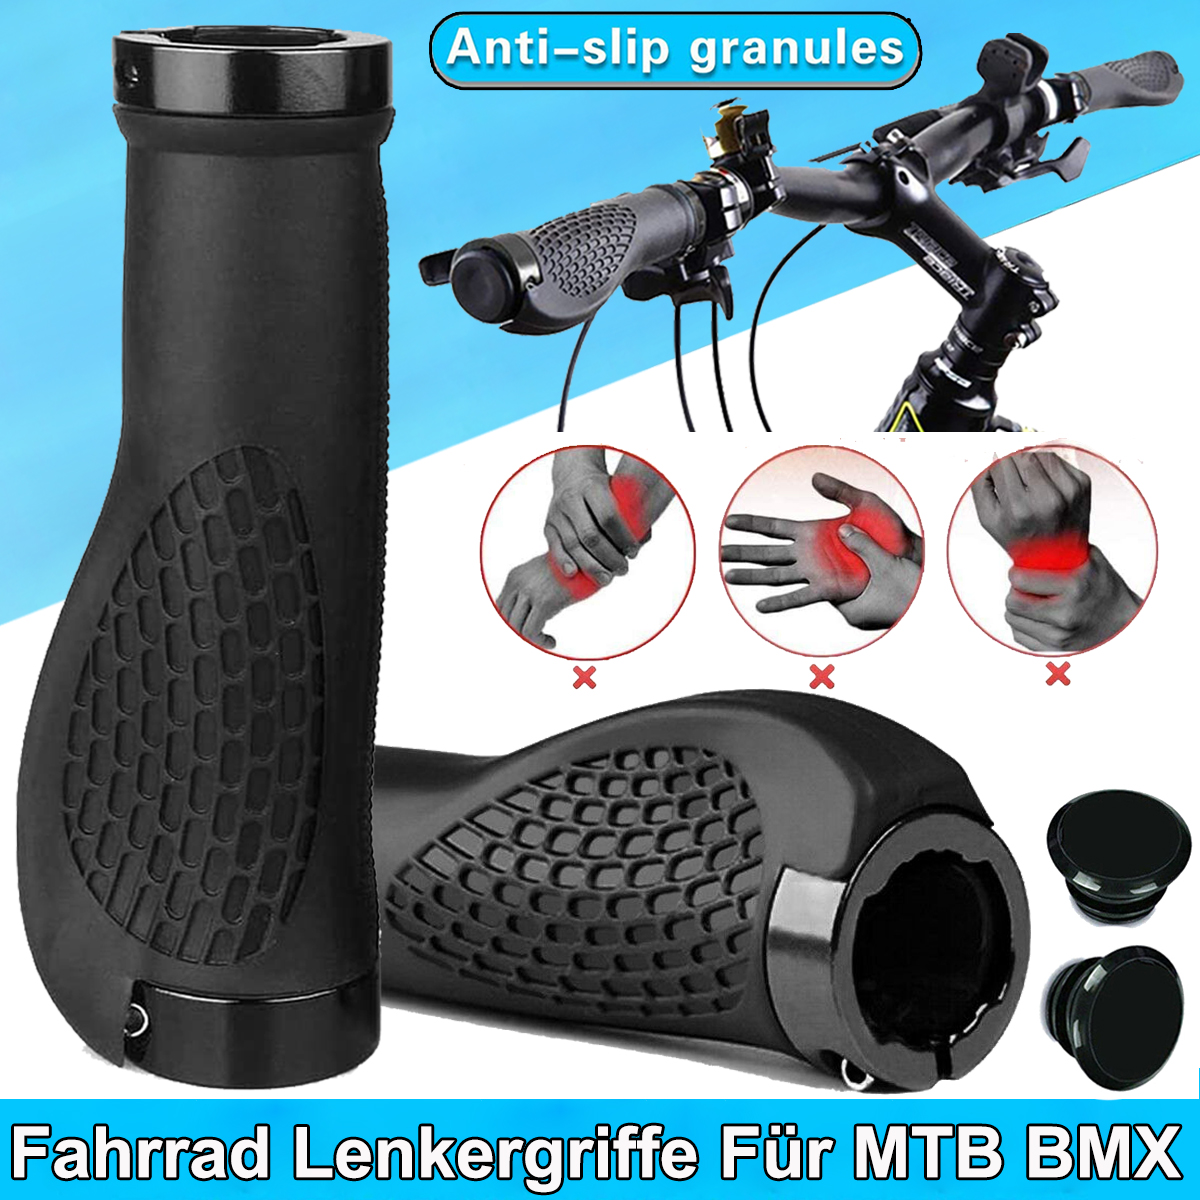 1 Parr Fahrrad Lenkergriffe Schraub-Griff Ergonomisch Ergogriffe Ergo Bar Grips